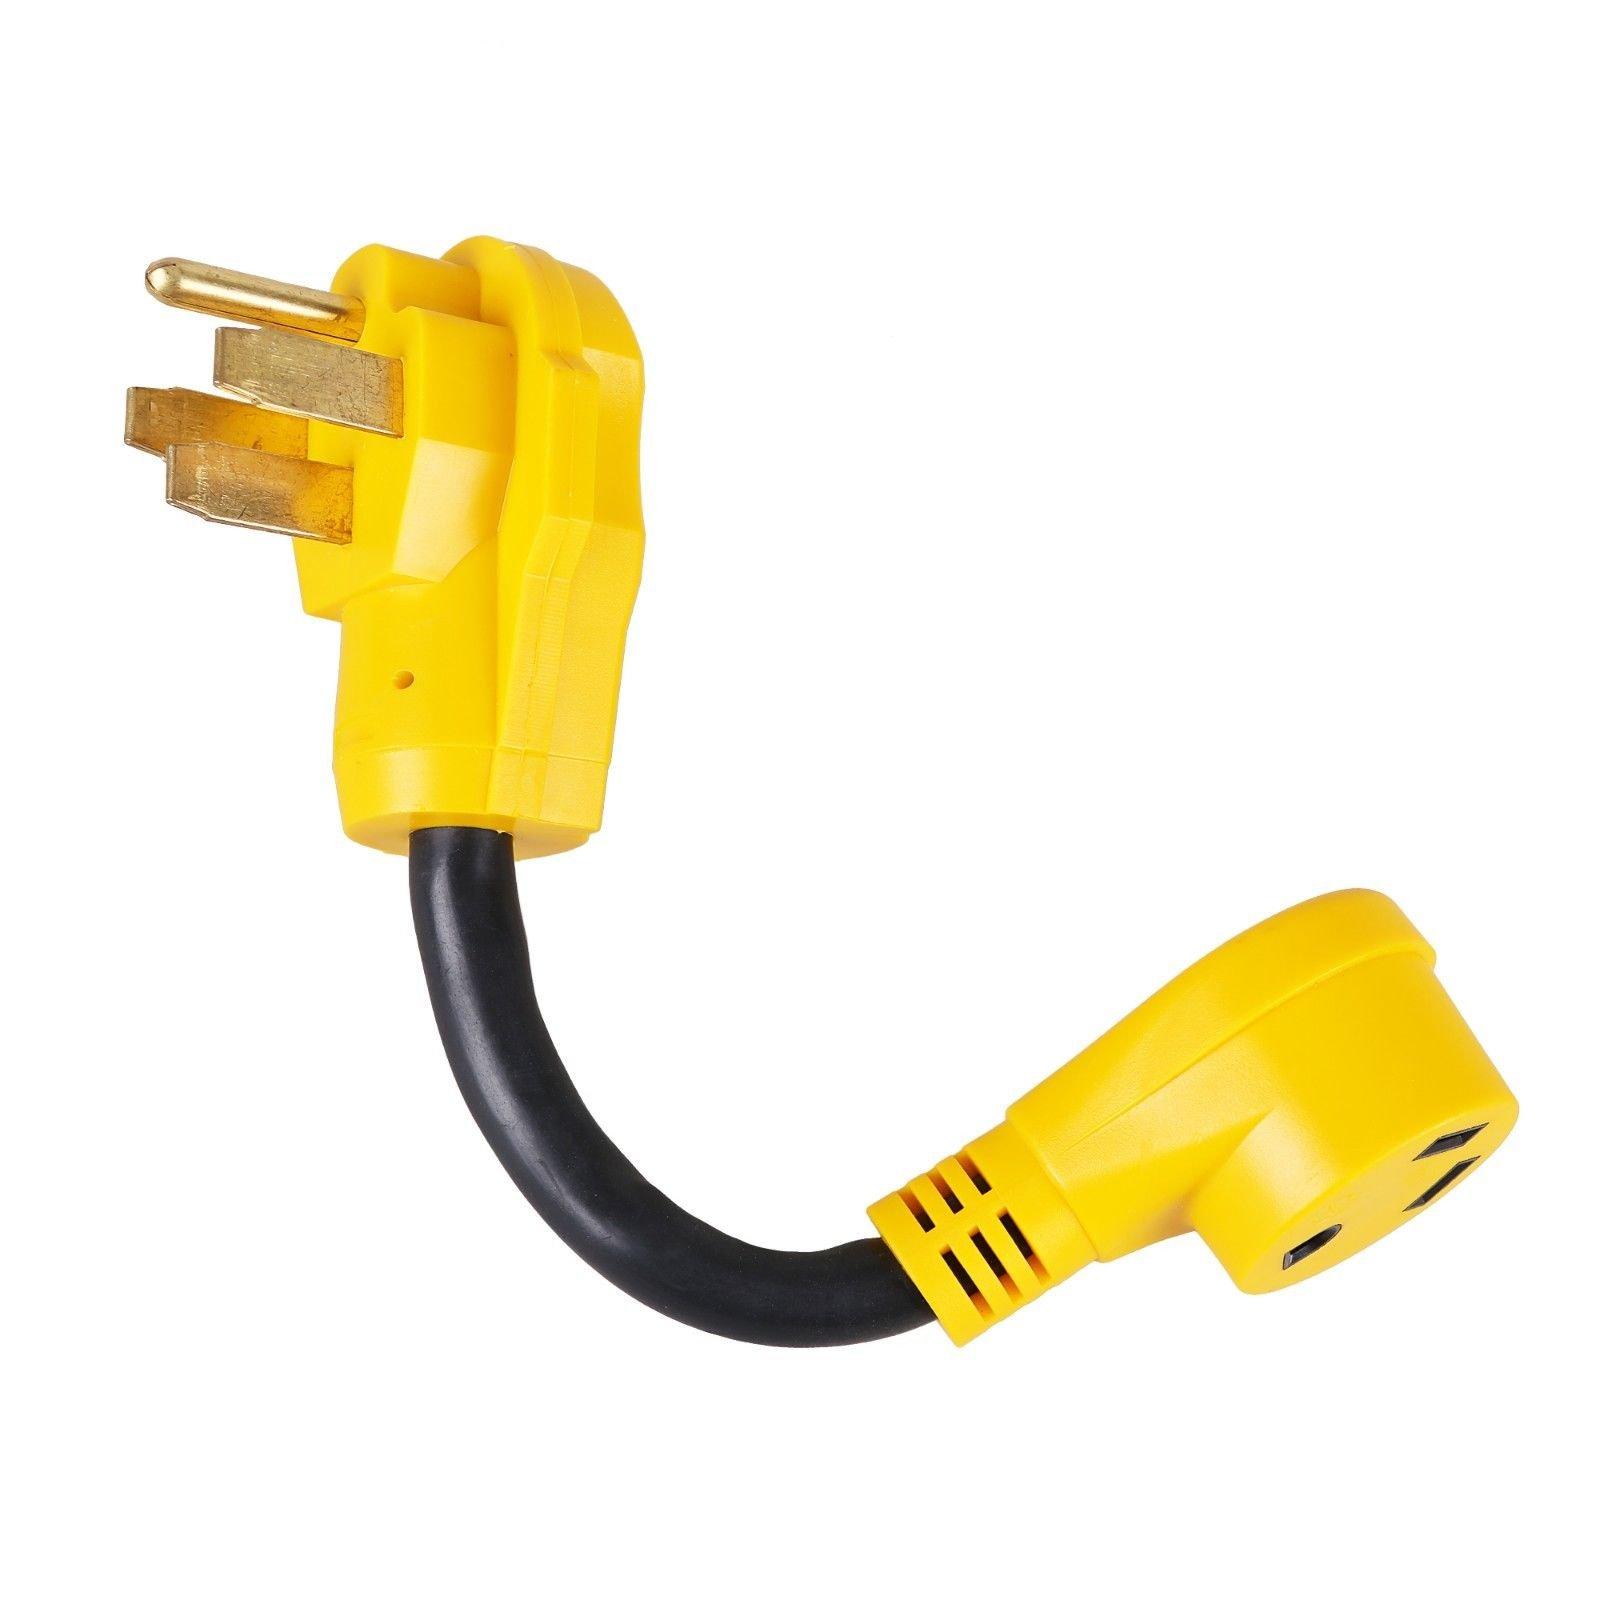 Epicord 12'' RV Dogbone Power Adaptors 50A Male to 30A Female 10AWG Cord